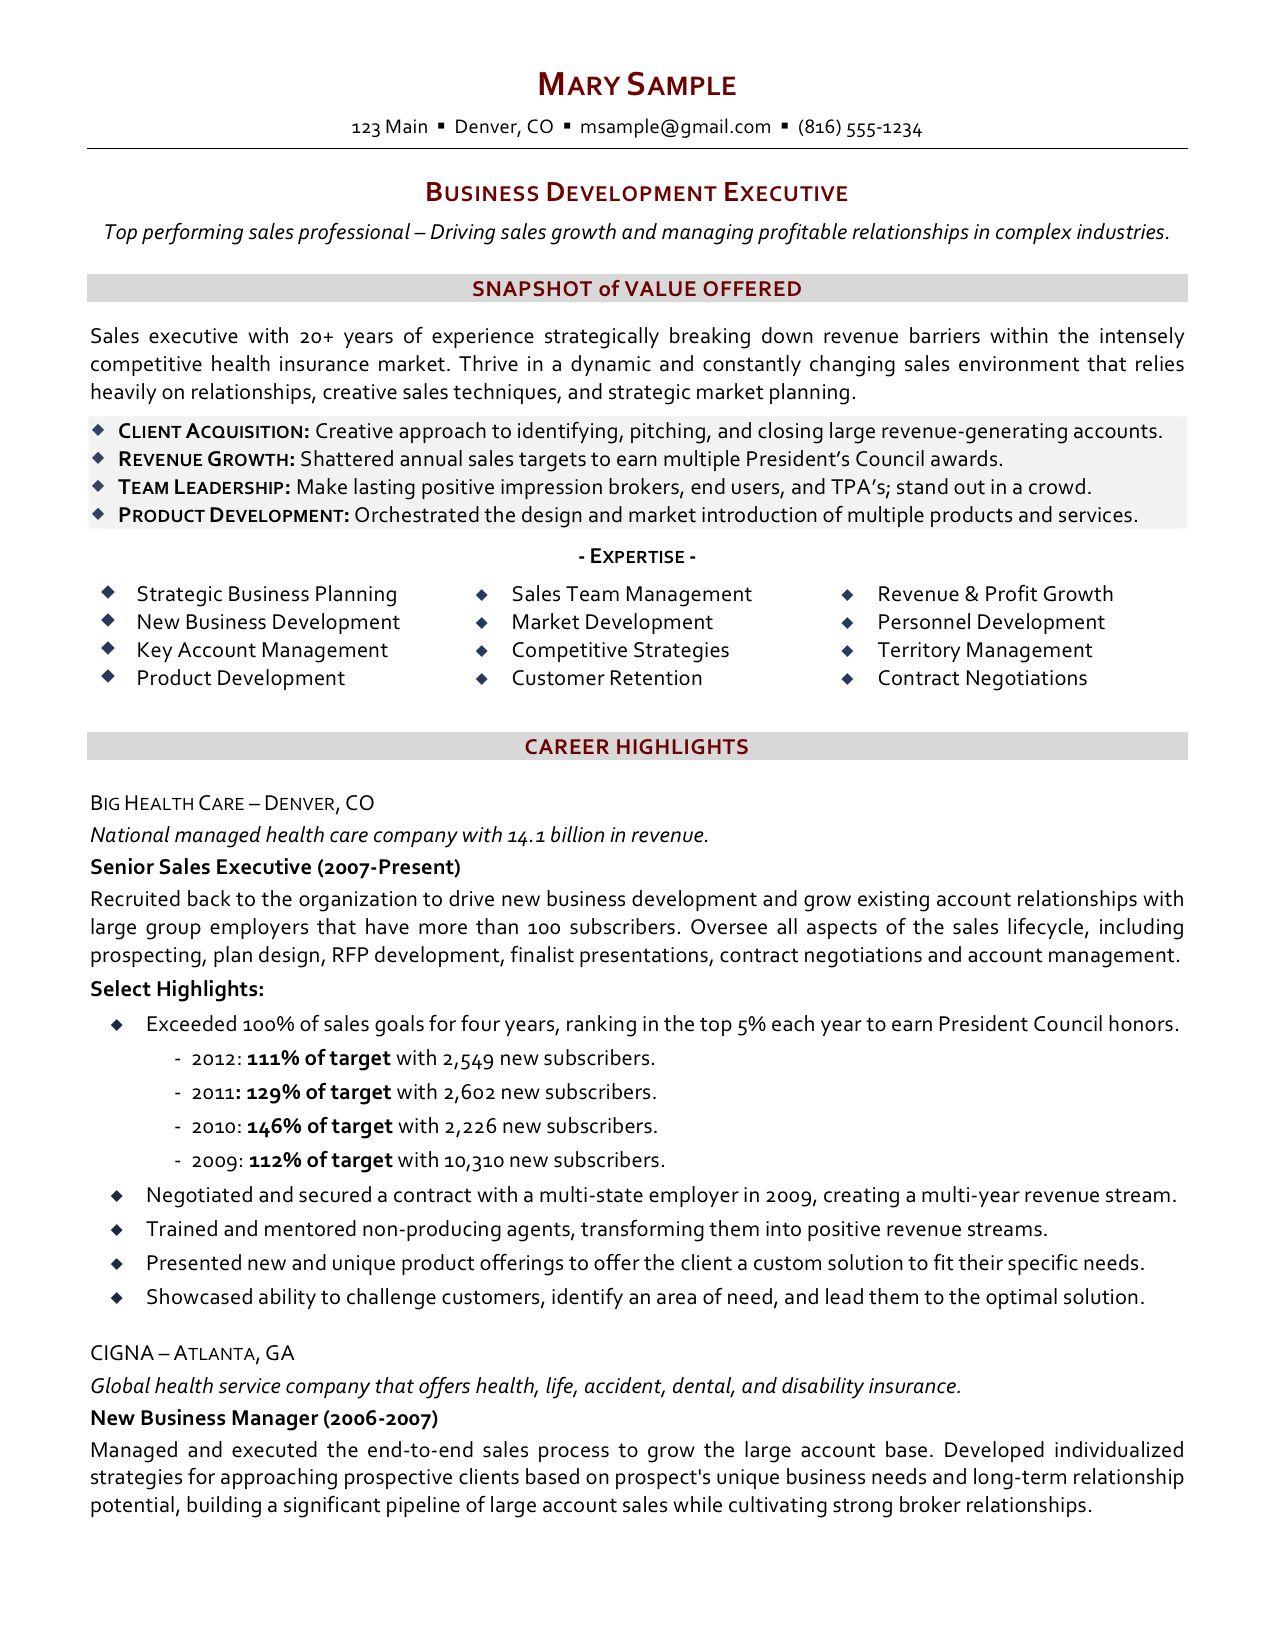 resume business plan template, skills, skills for customer service job sr qa analyst database engineer